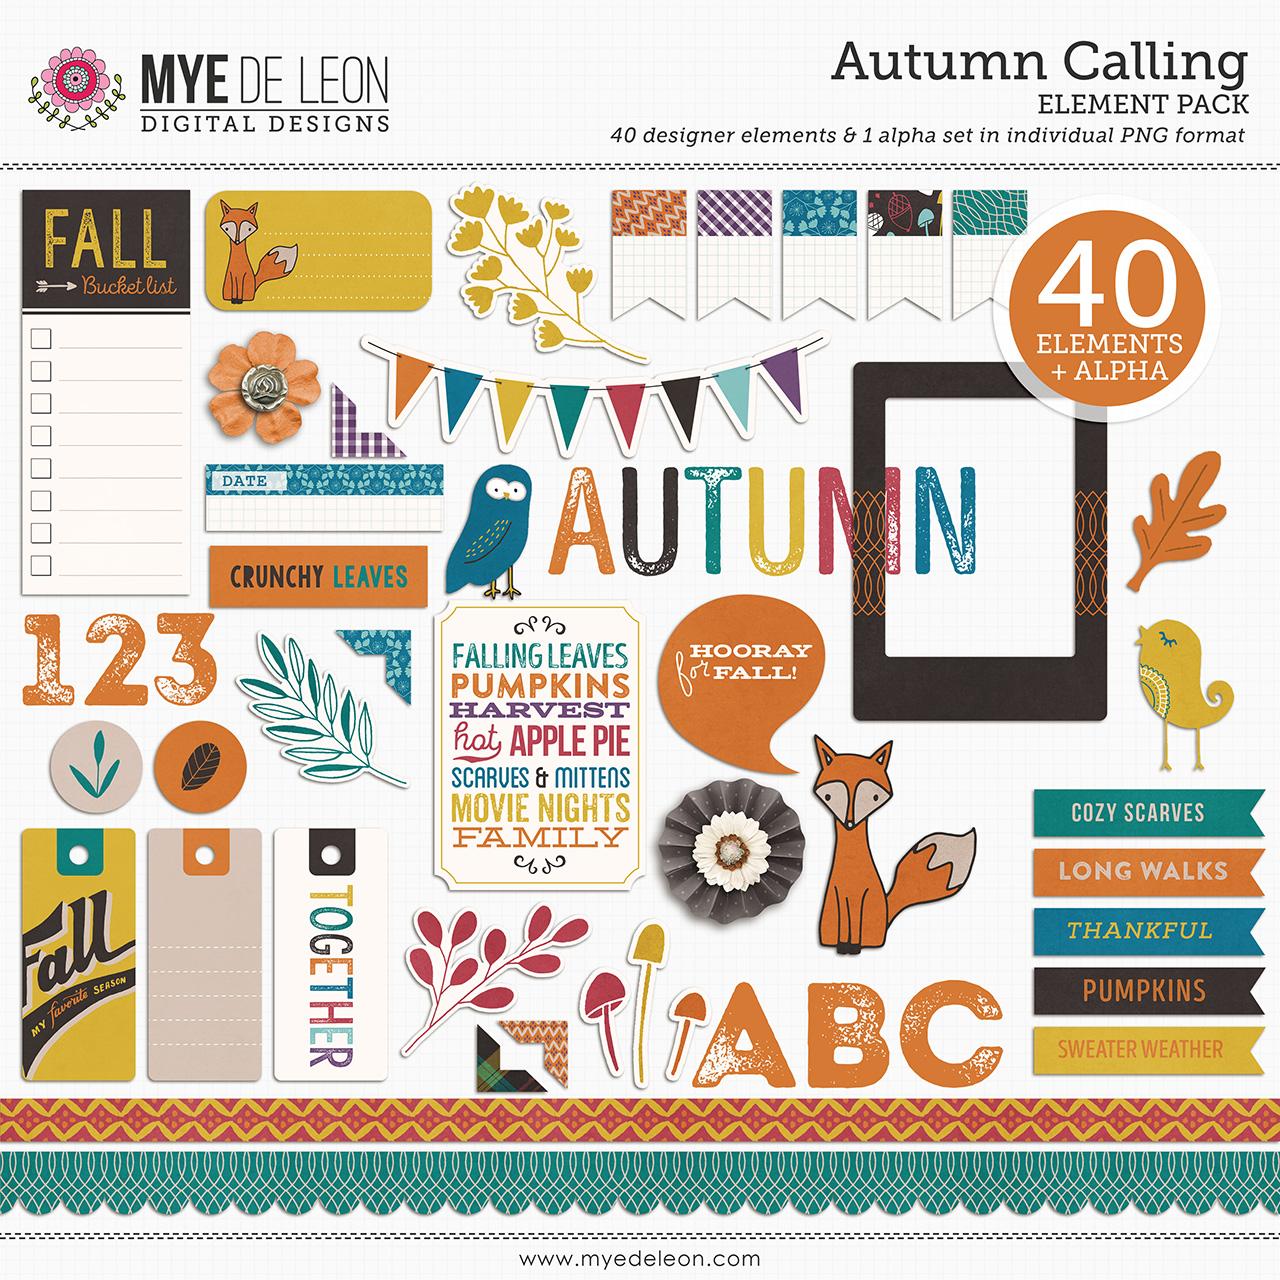 Autumn Calling | Element Pack